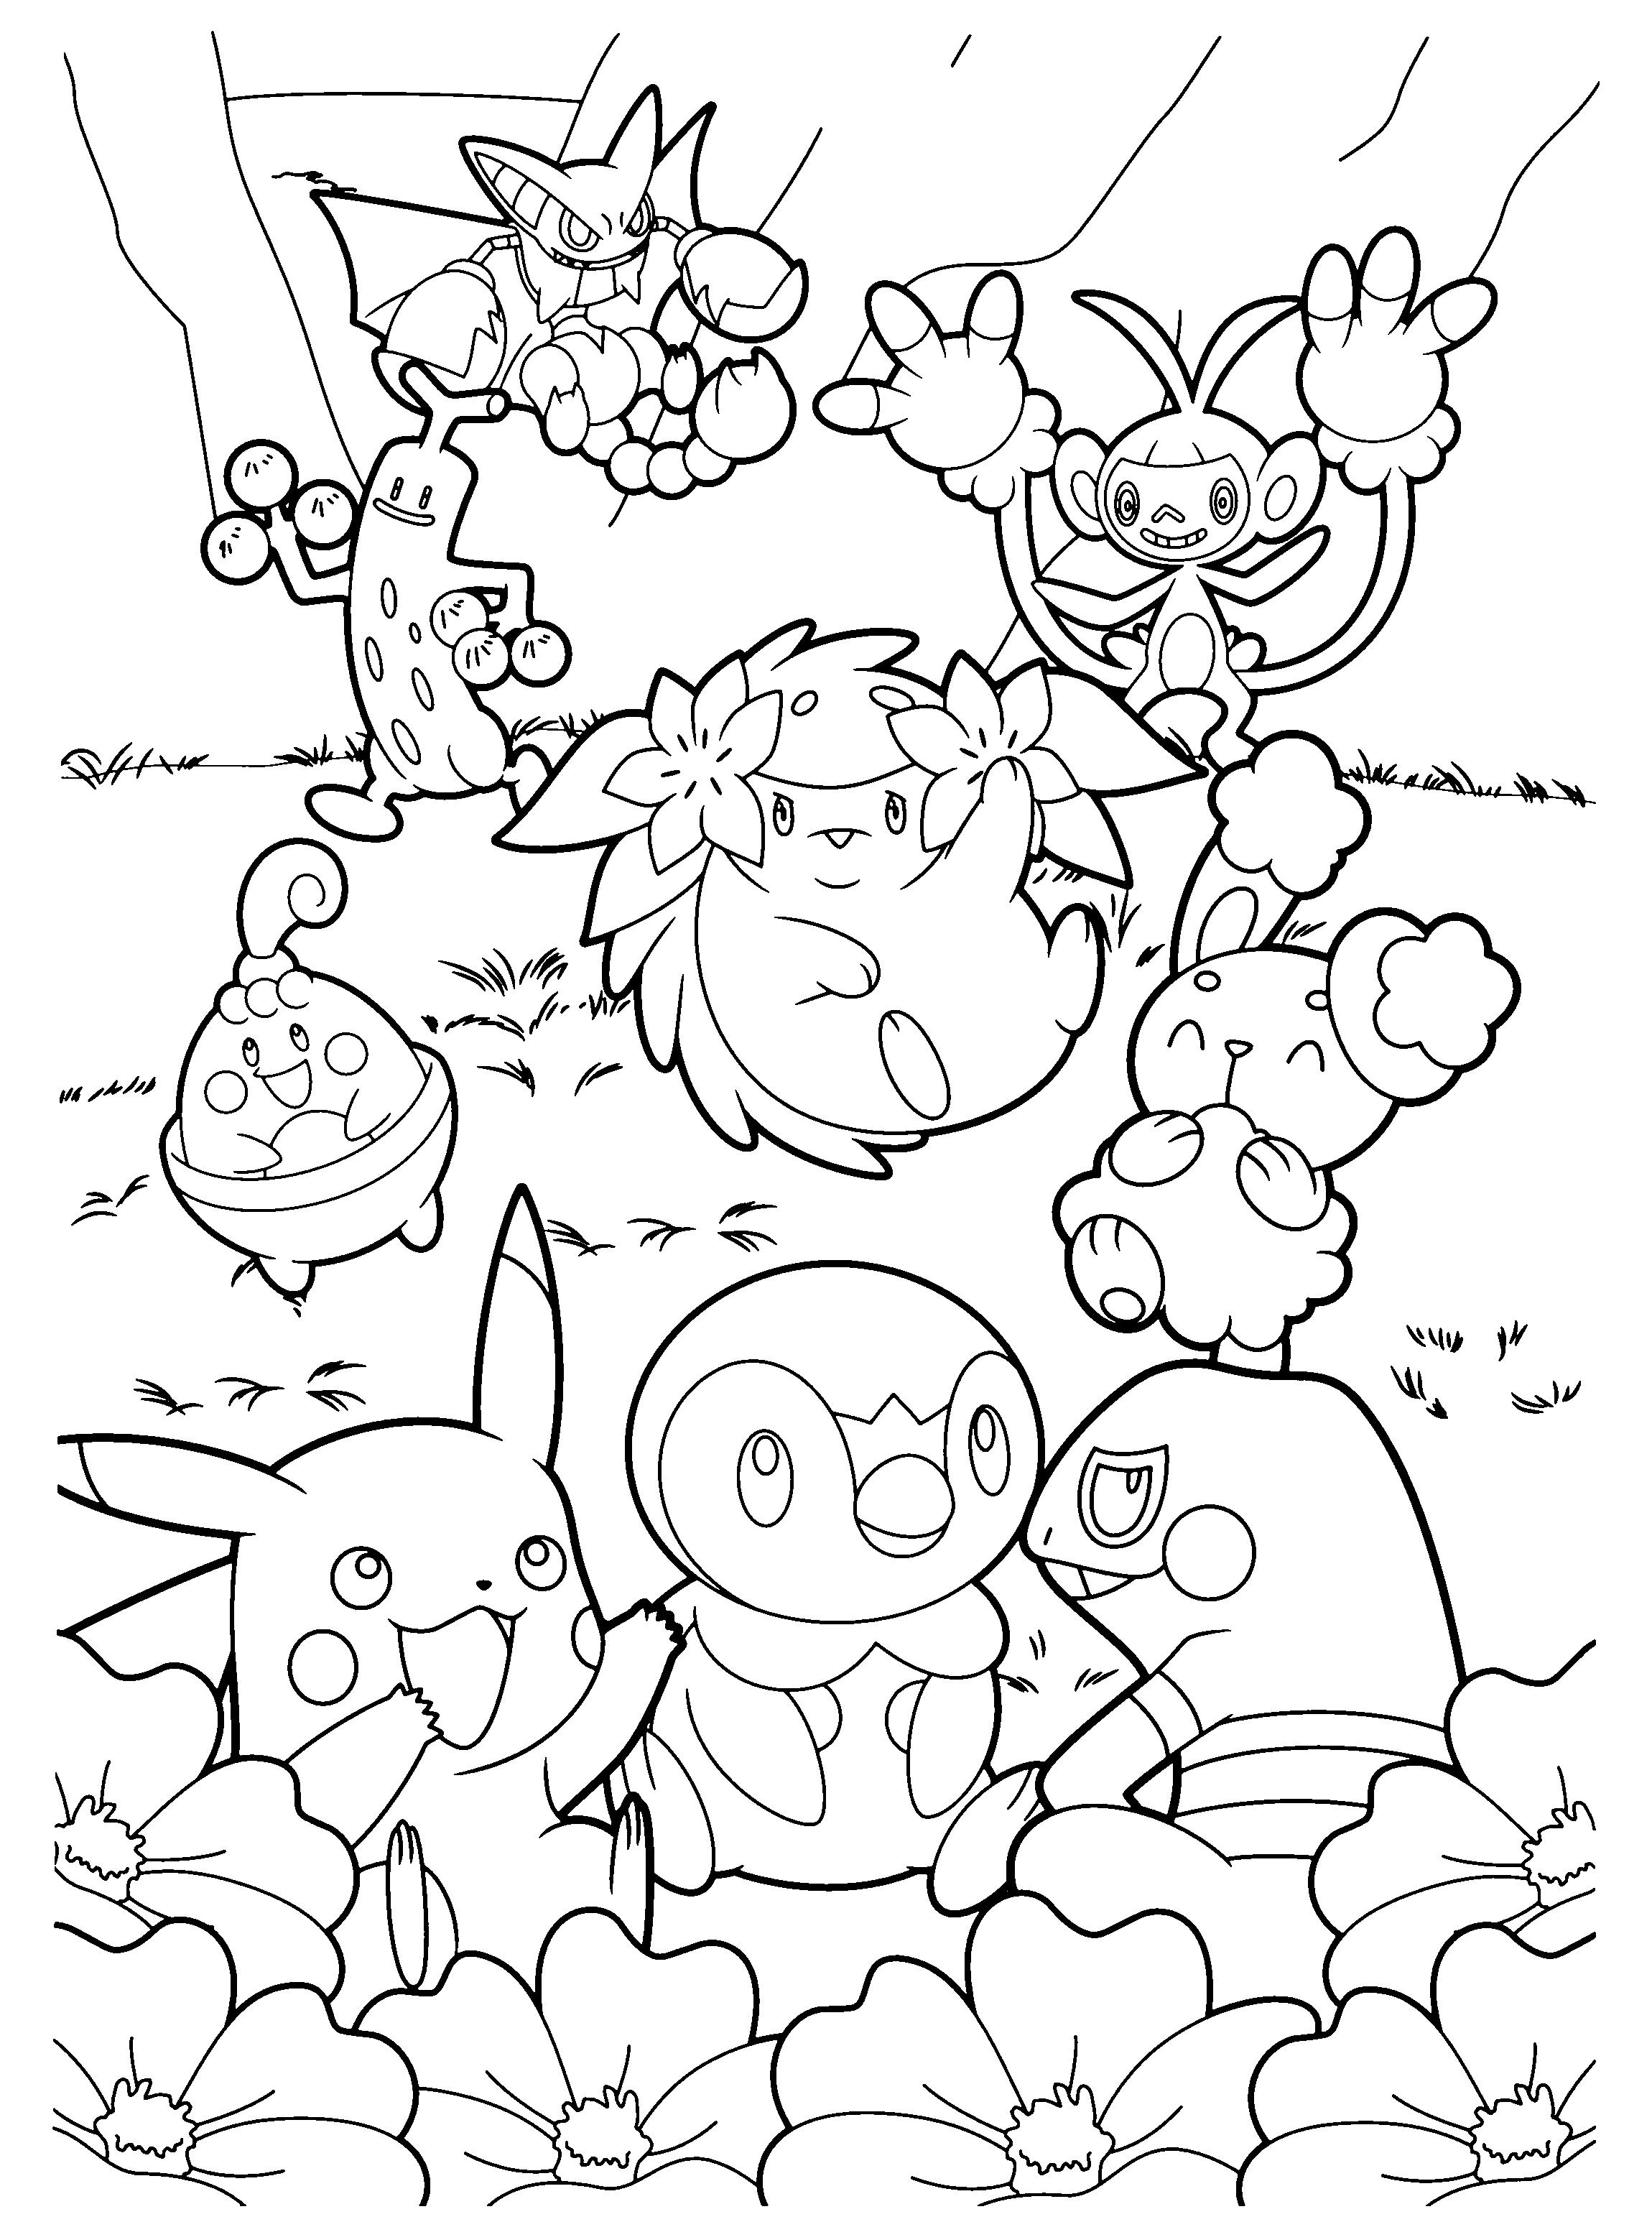 Pokemon diamond pearl coloring pages V ritysteht vi